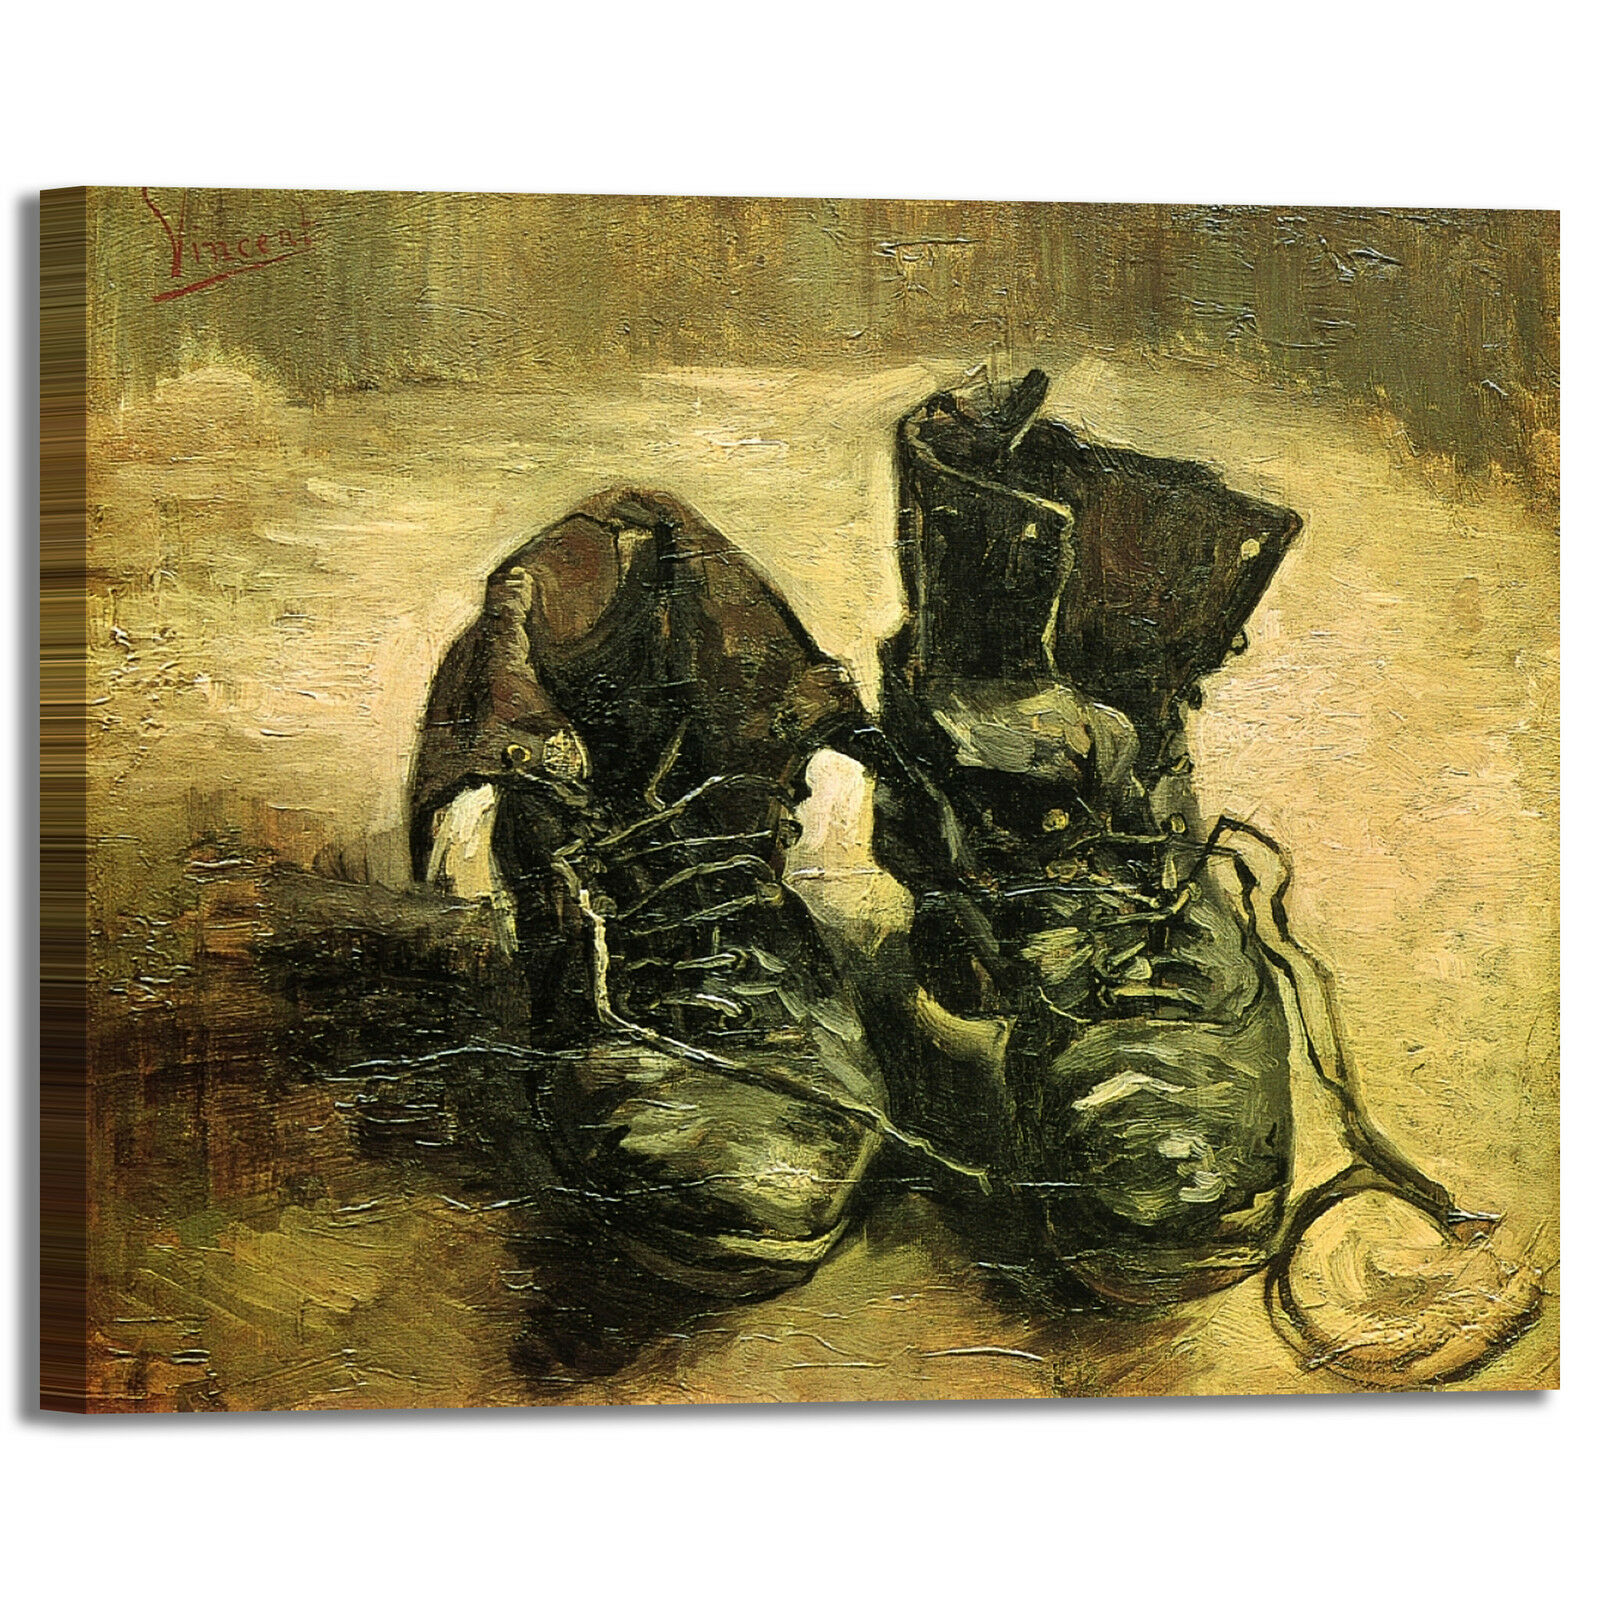 Van Gogh un paio di scarpe design quadro stampa tela dipinto telaio arrossoo casa